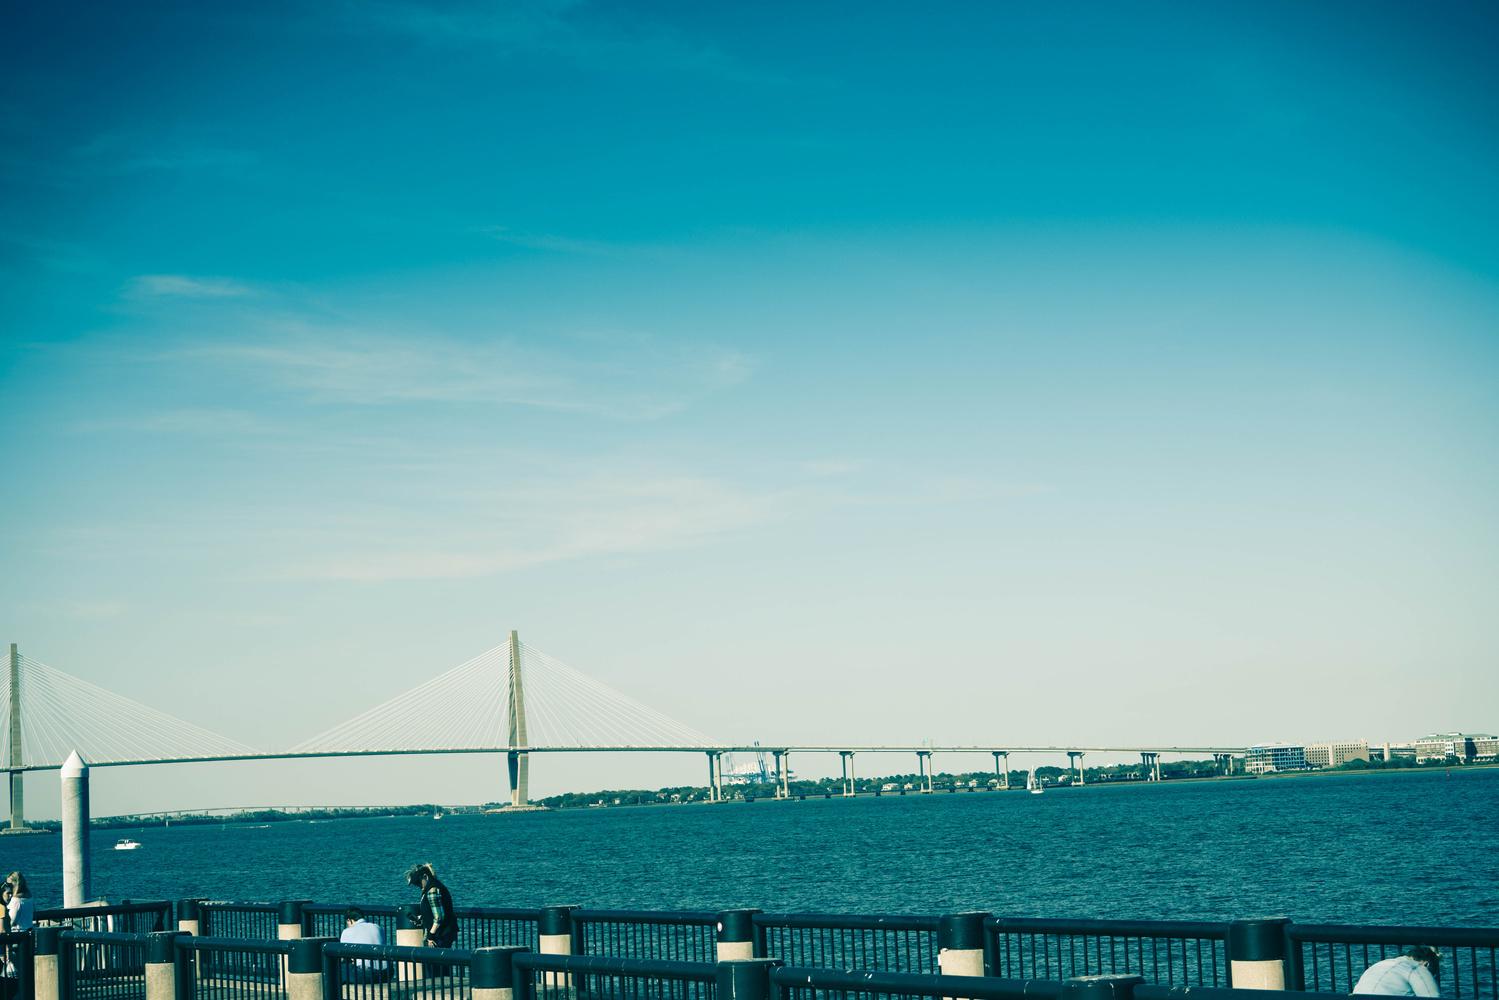 Charleston Harbor by Luis Santana